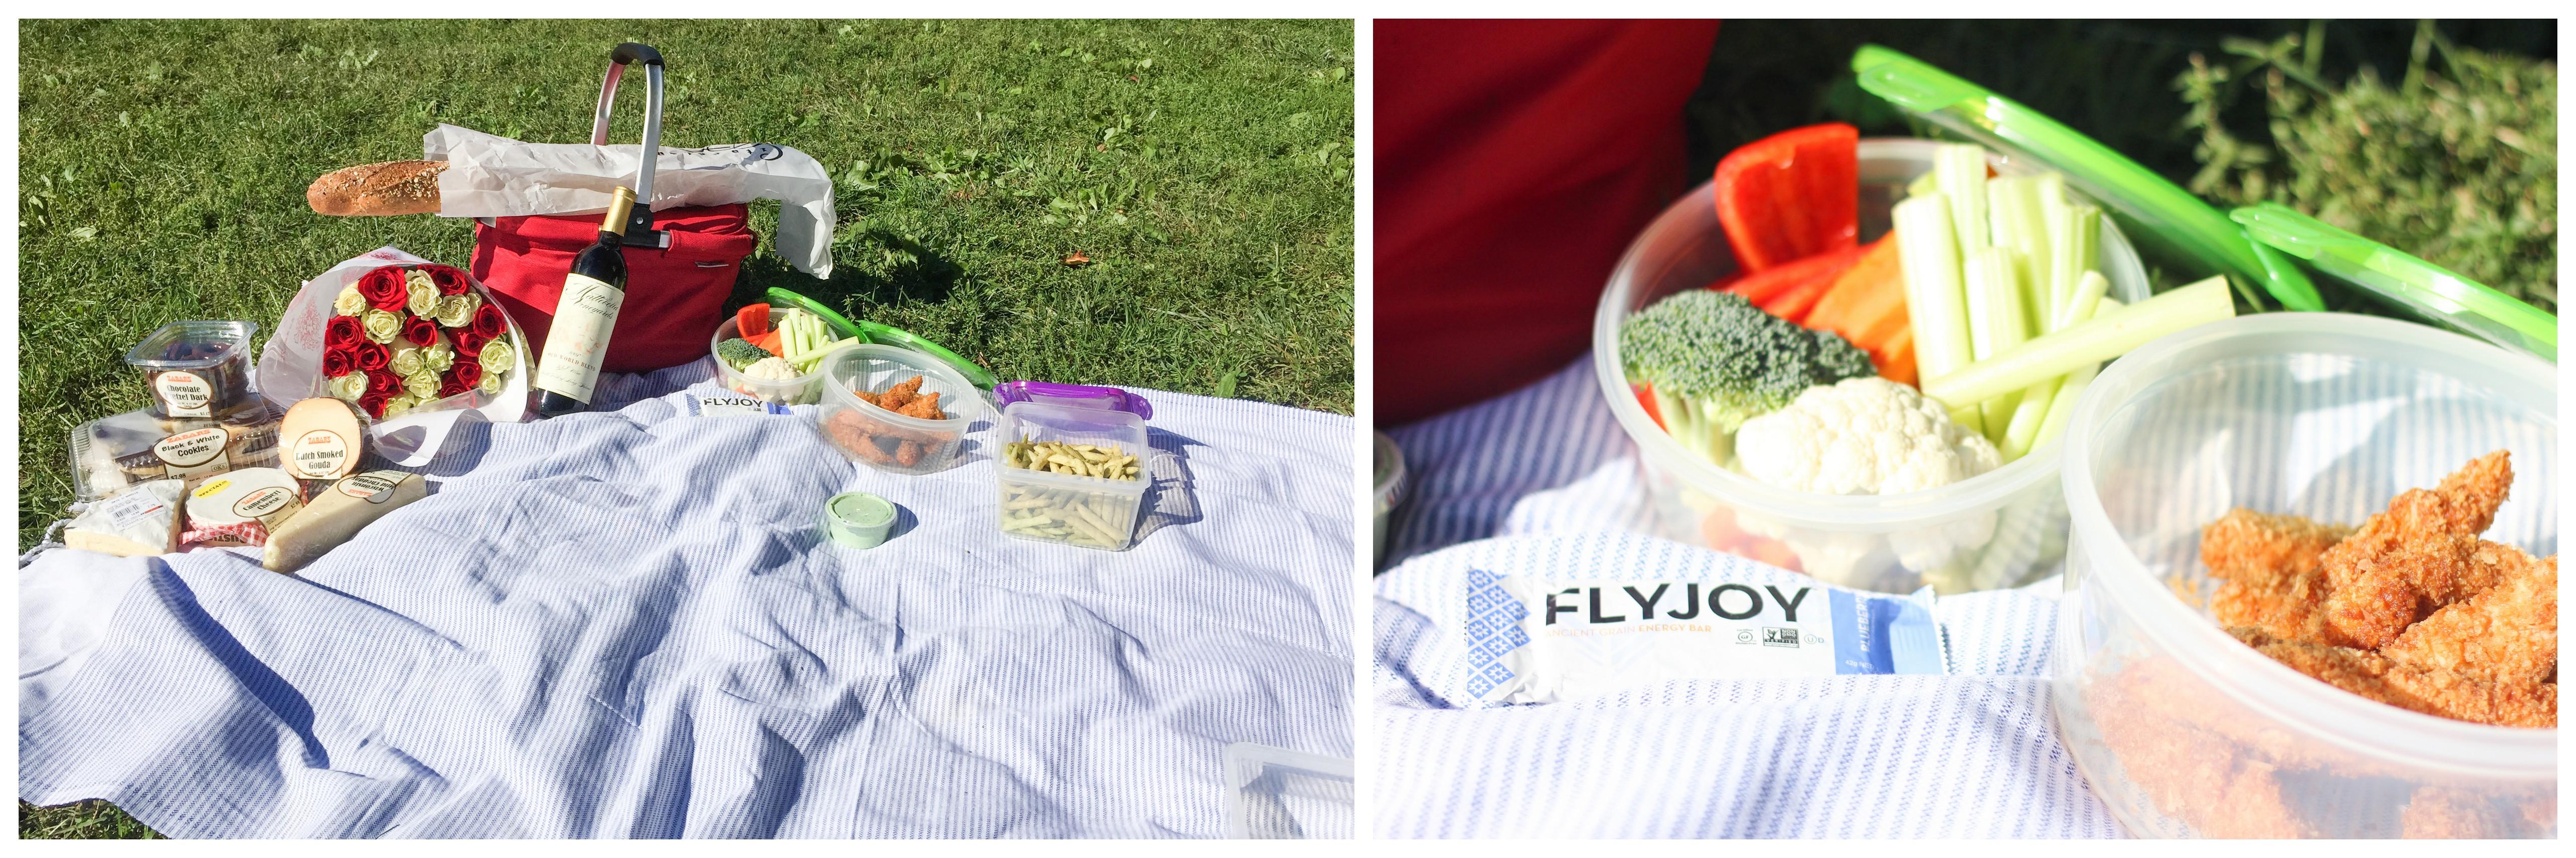 shein-picnic-edited-001